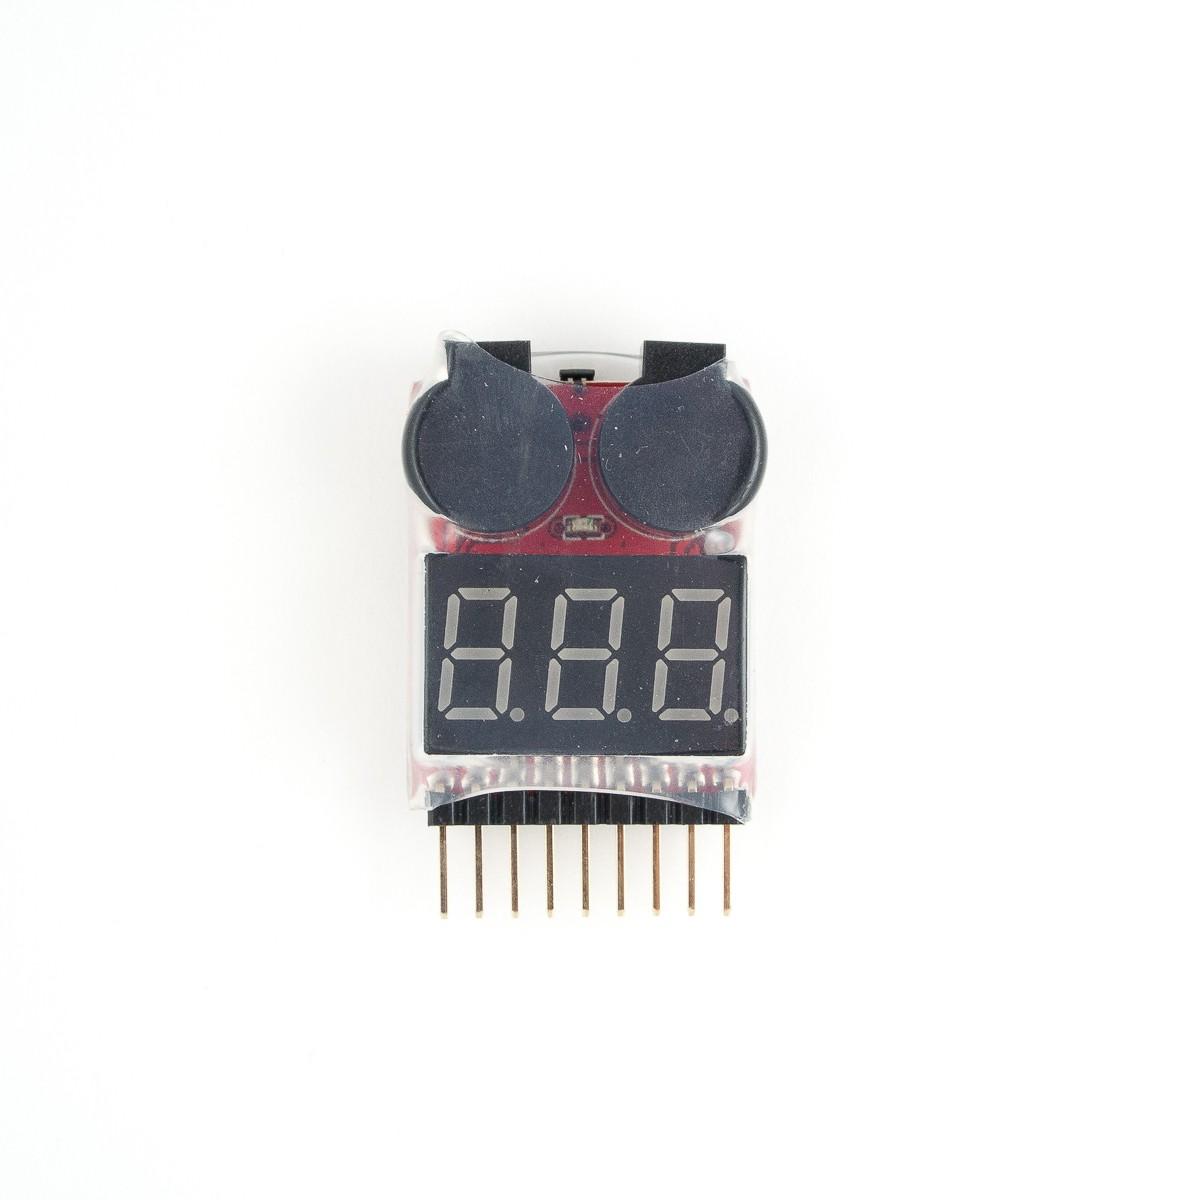 Lipo Cell Voltage Tester Low Alarm Fpvee Circuit